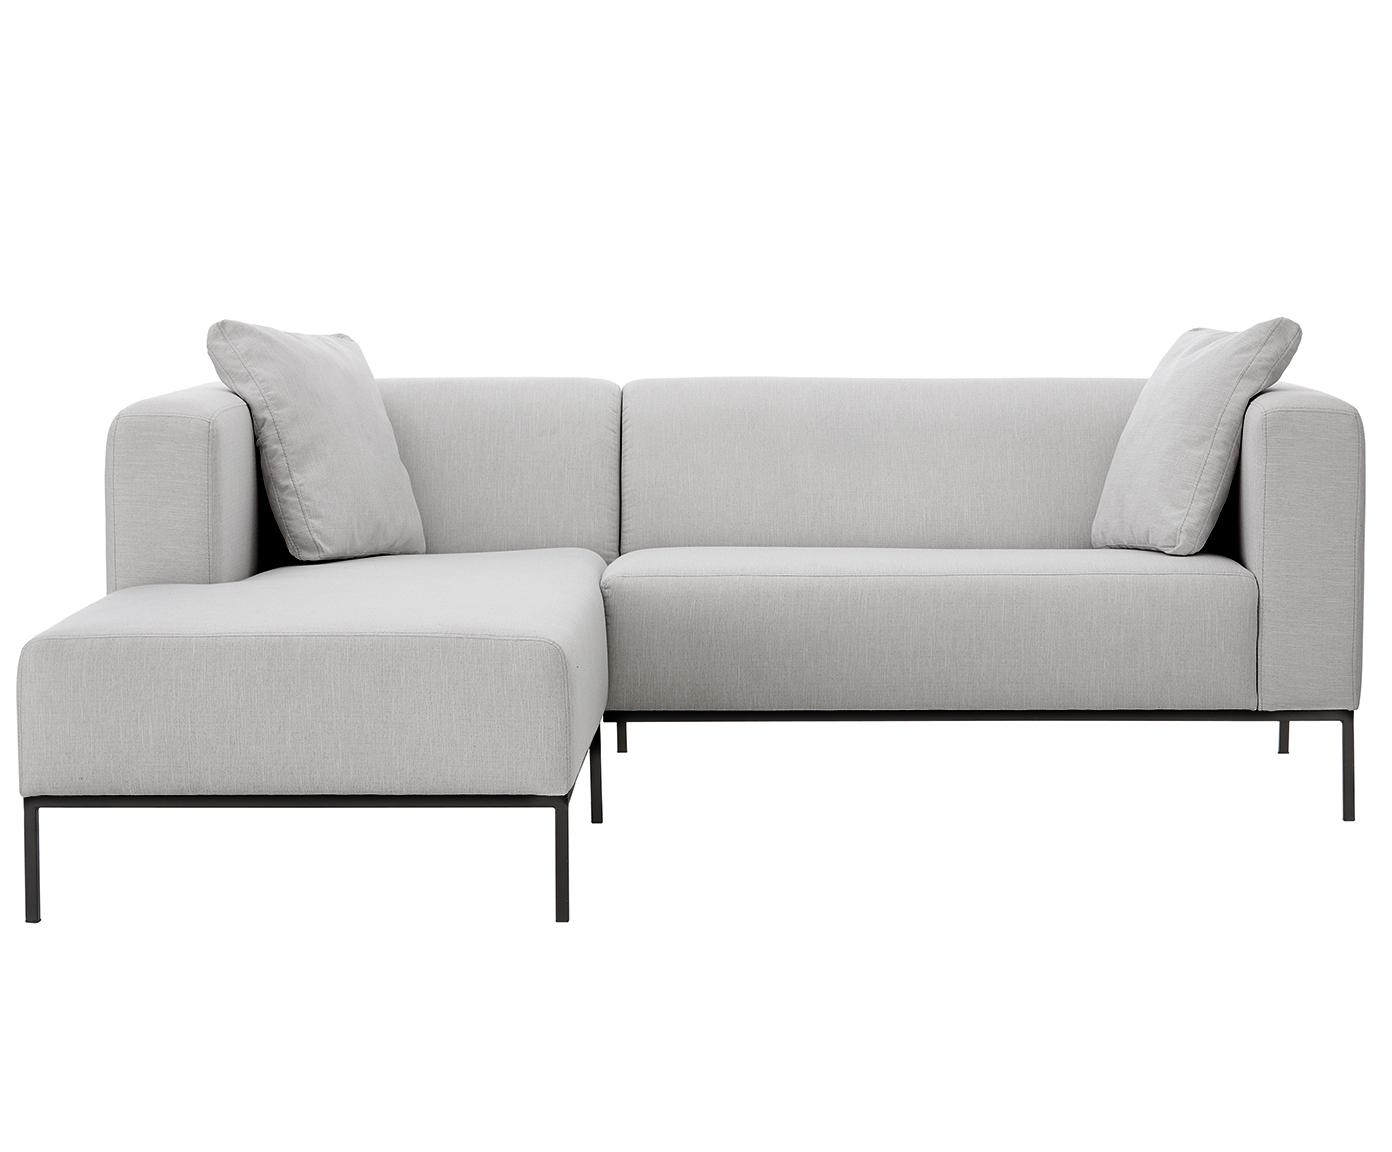 Hoekbank Carrie, Bekleding: polyester, Frame: spaanplaat, hardboard, mu, Poten: gelakt metaal, Webstoff Grau, B 241 x D 200 cm